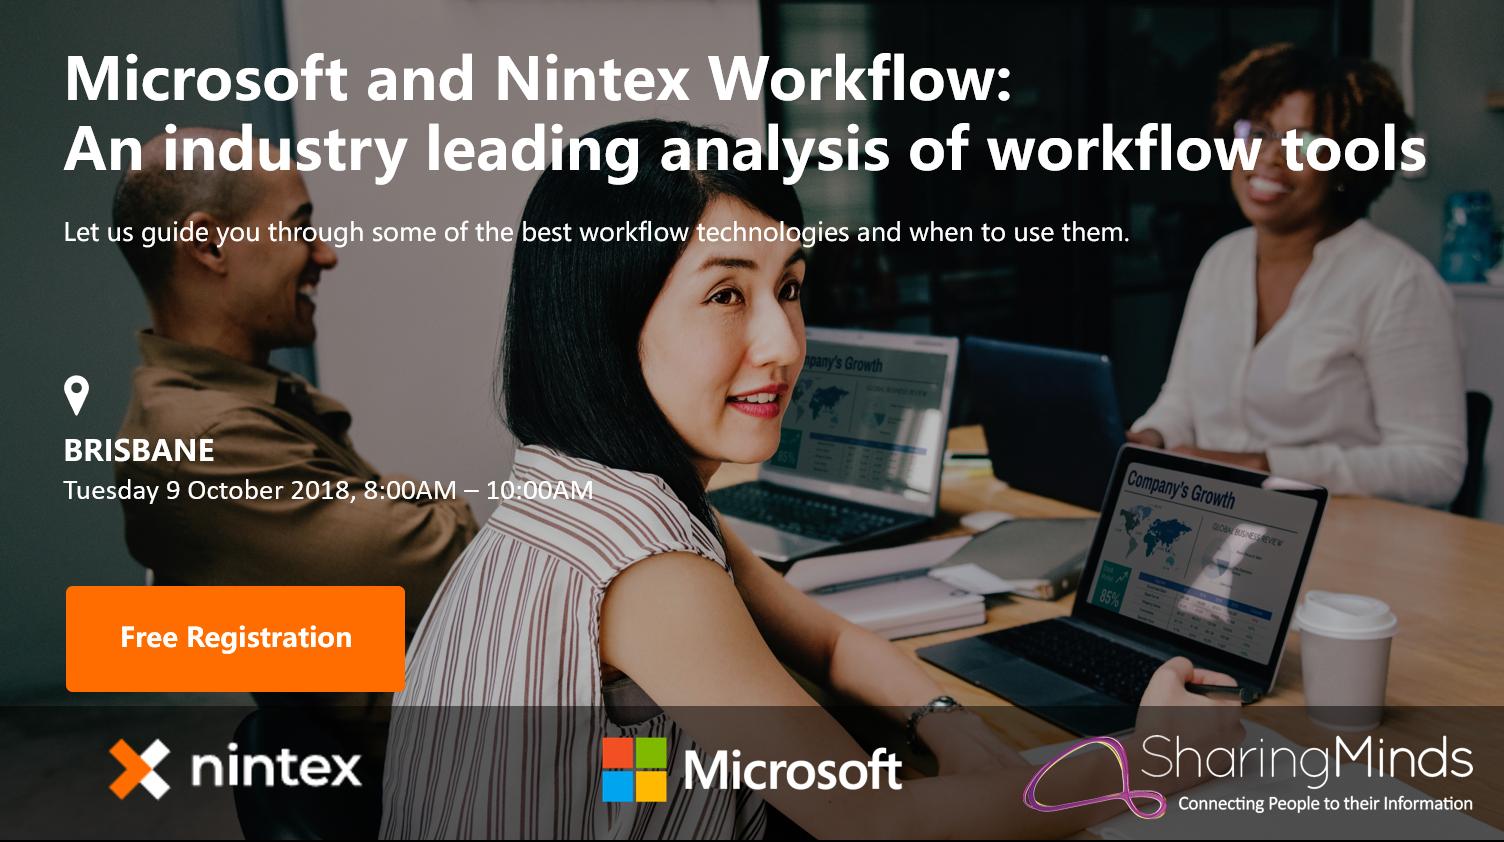 Nintex Sharing Minds Microsoft Breakfast - Brisbane